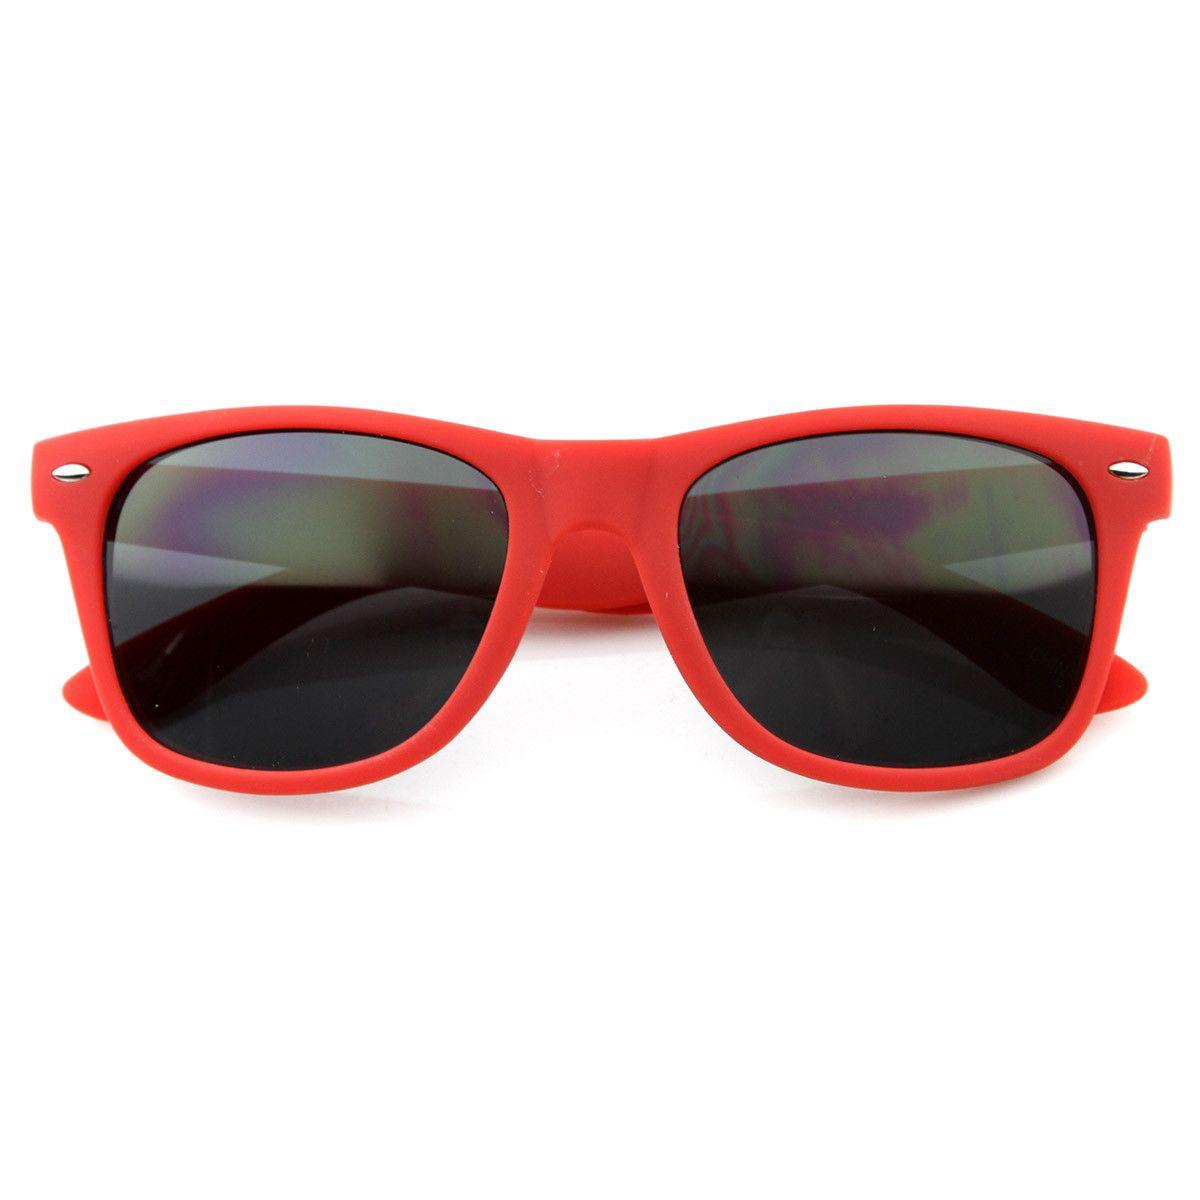 f62dc37309eea Classic 80s Retro Rubberized Soft Finish Matte Red Color Horn Rimmed  Sunglasses